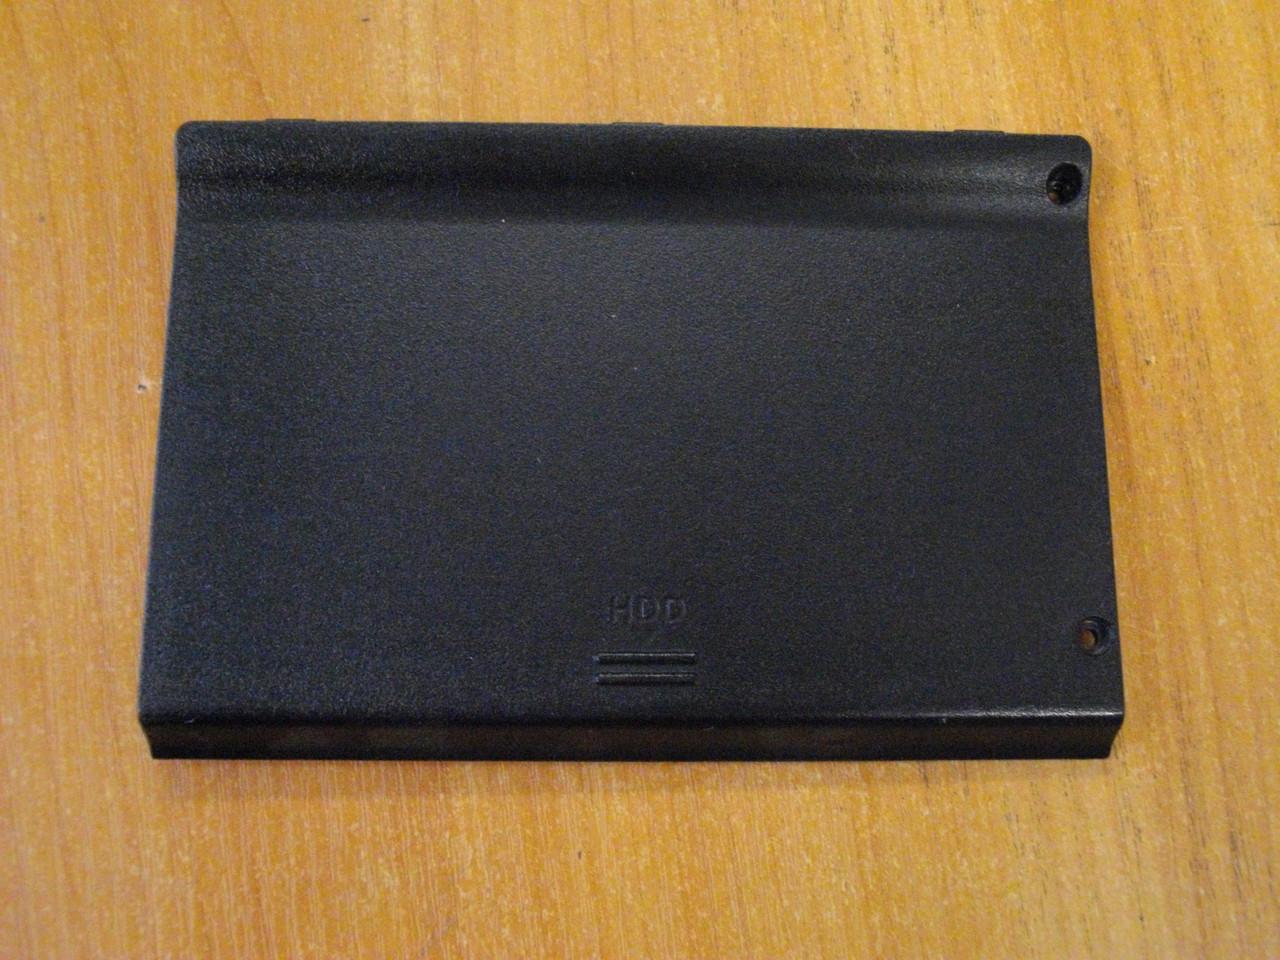 Сервисная Крышка HDD BA81-03832A  Люк Корпус от ноутбука Samsung R60 NP-R60 бу